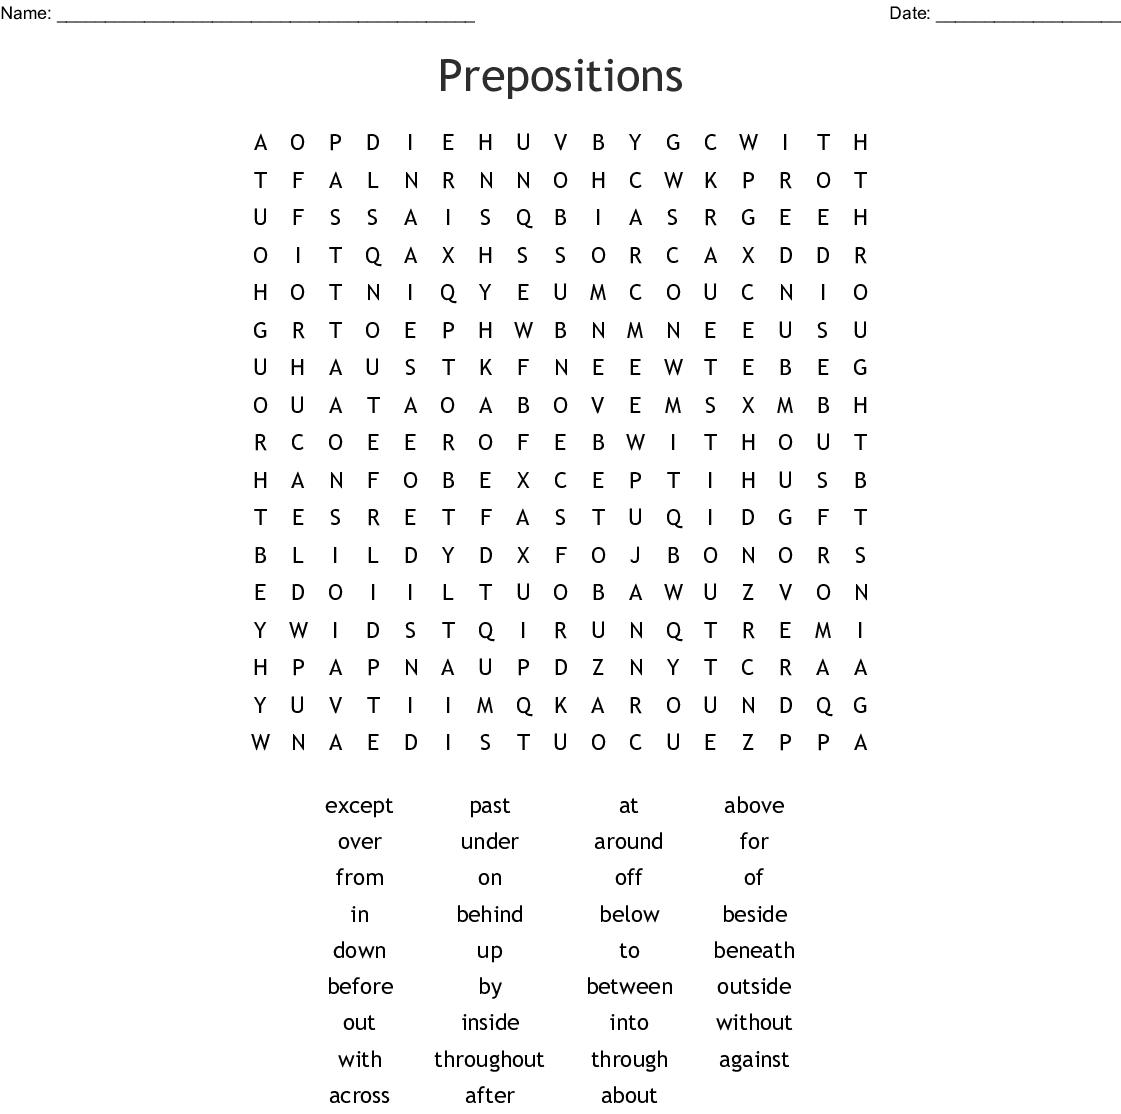 Preposition Word Search